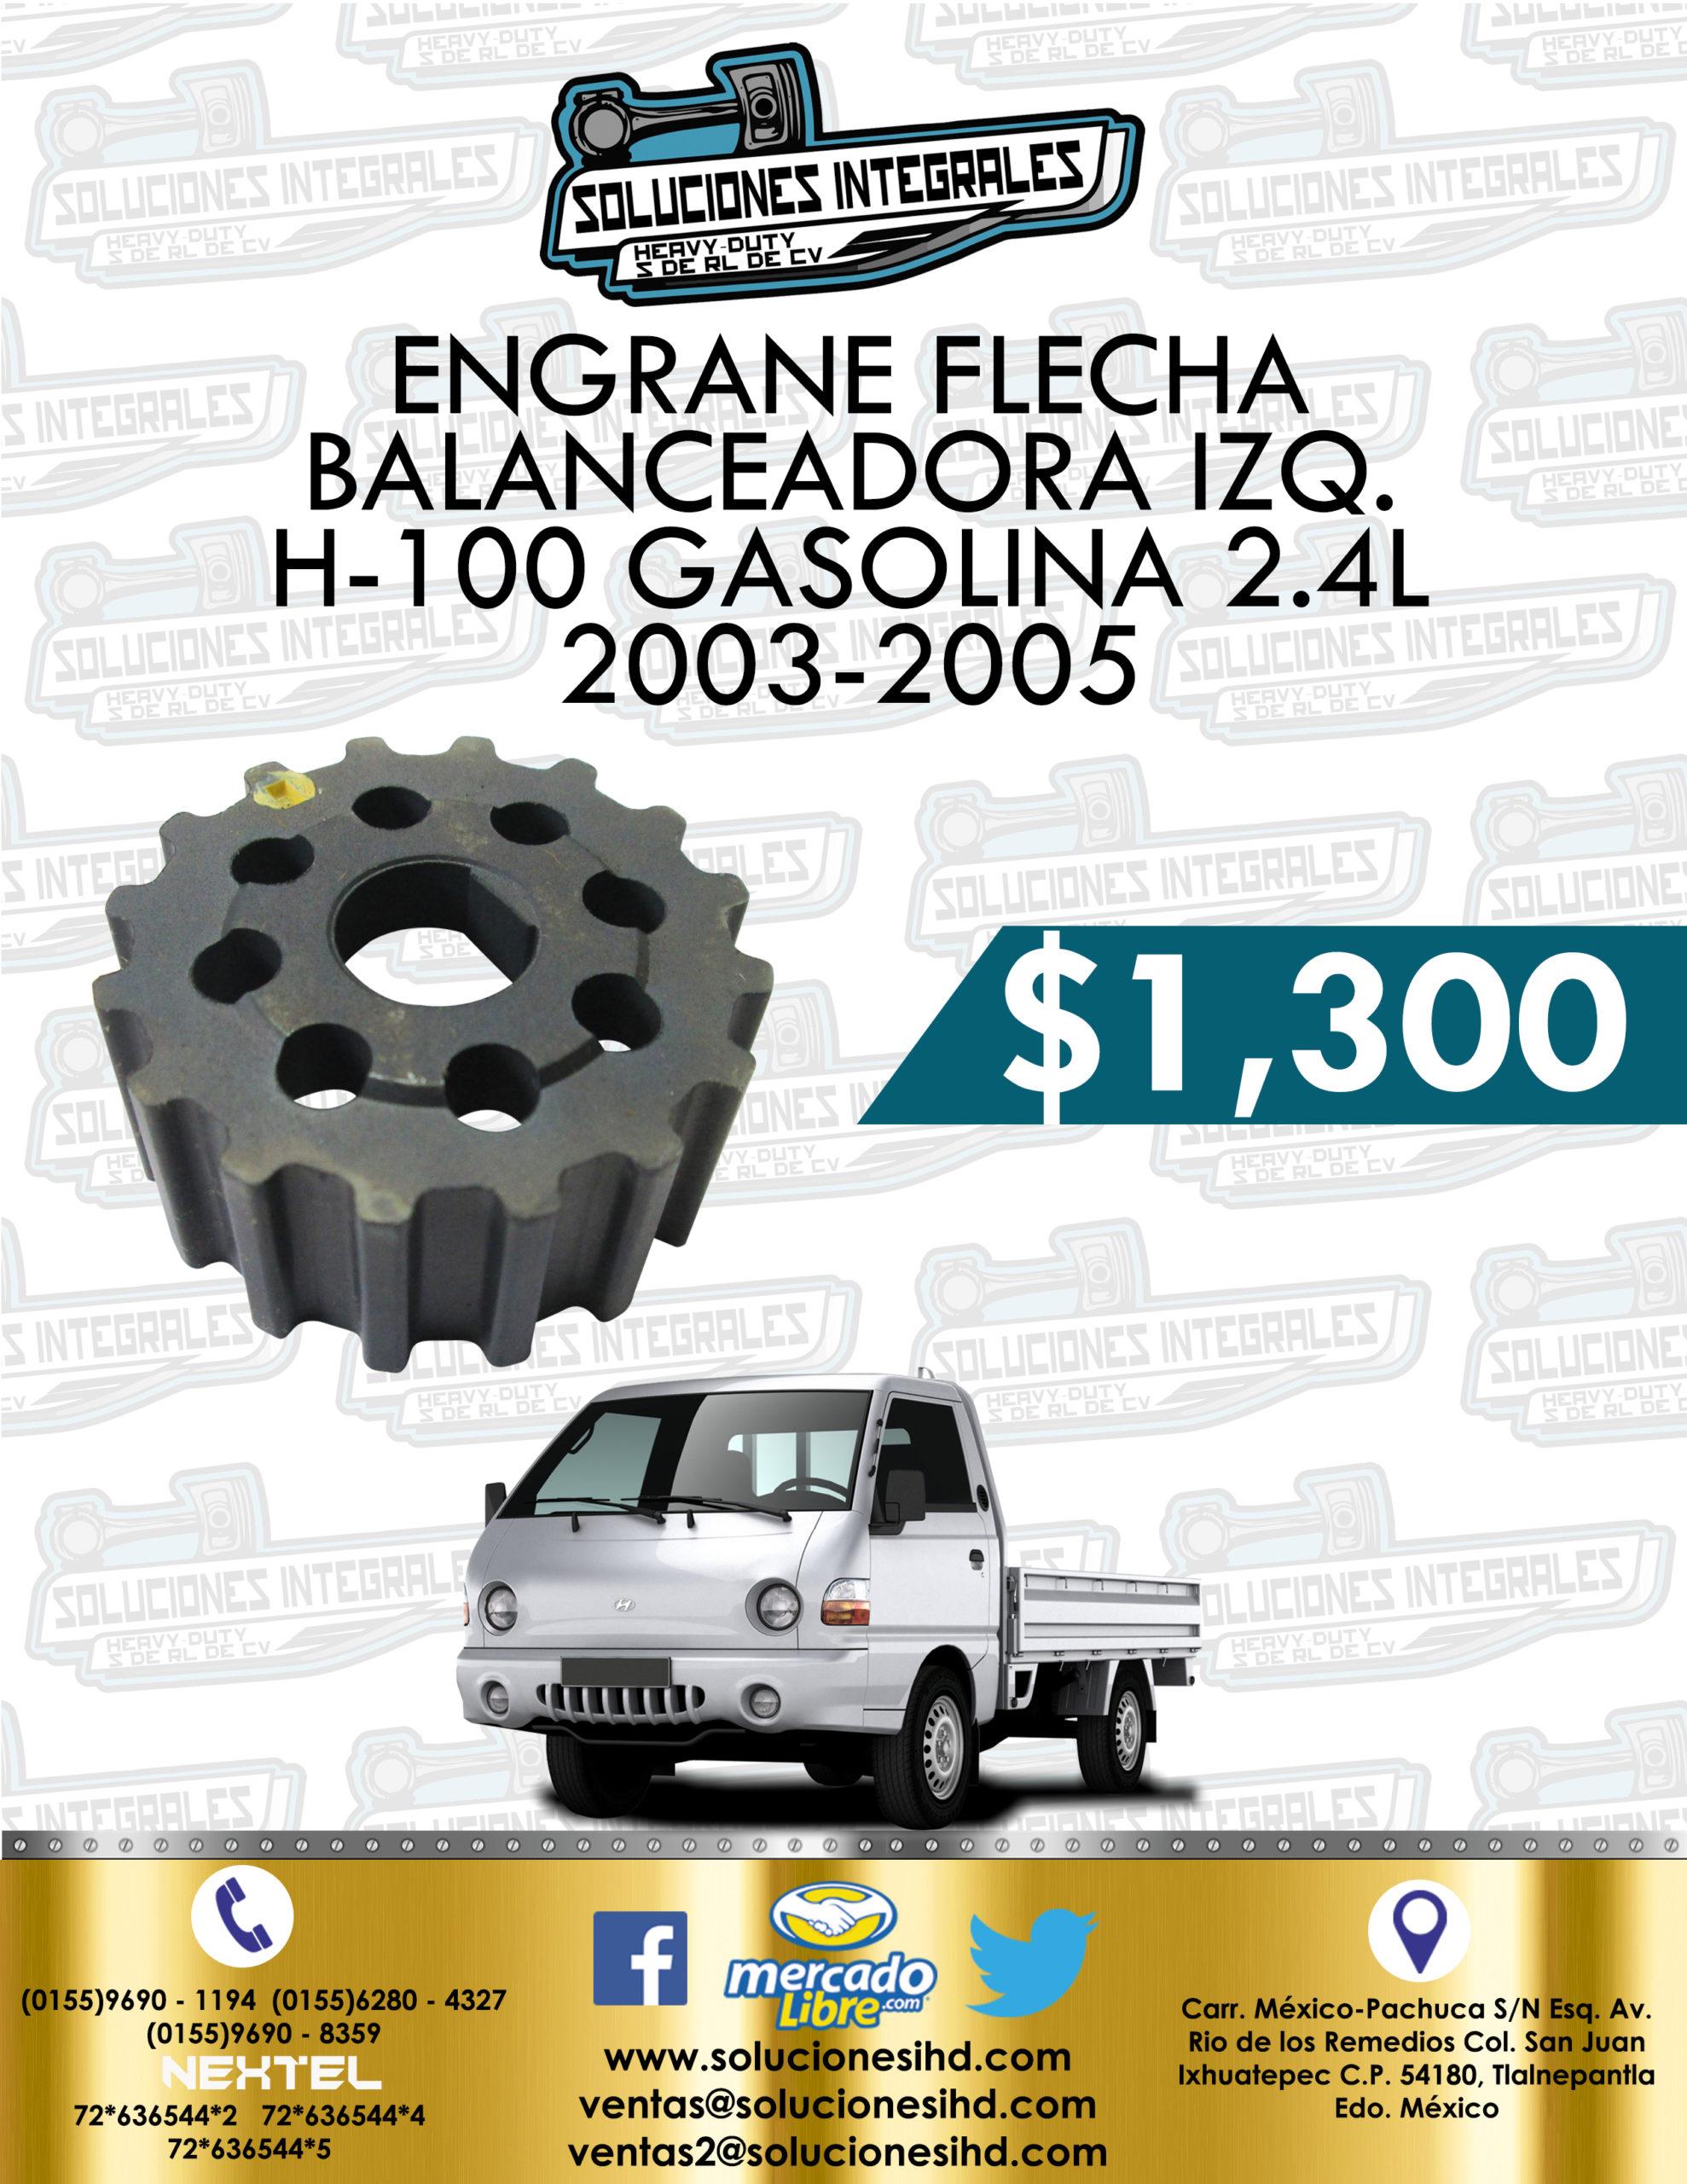 ENGRANE FLECHA BALANCEADORA IZQUIERDA H-100 GASOLINA 2.4L